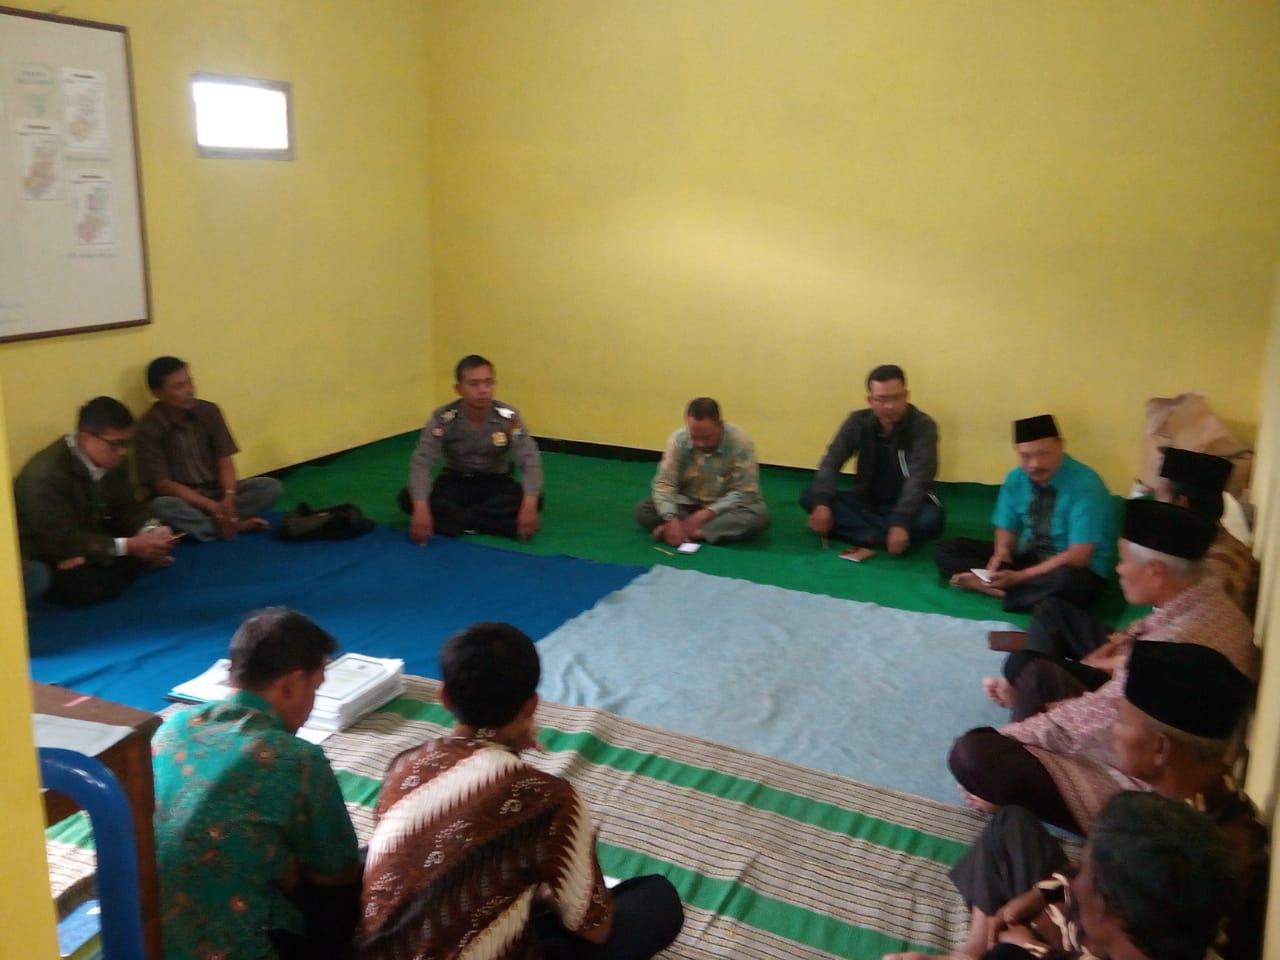 Bhabinkamtibmas Polsek Pujon Polres Batu (3 Pilar) Rapat Koordinasi Dengan BPD